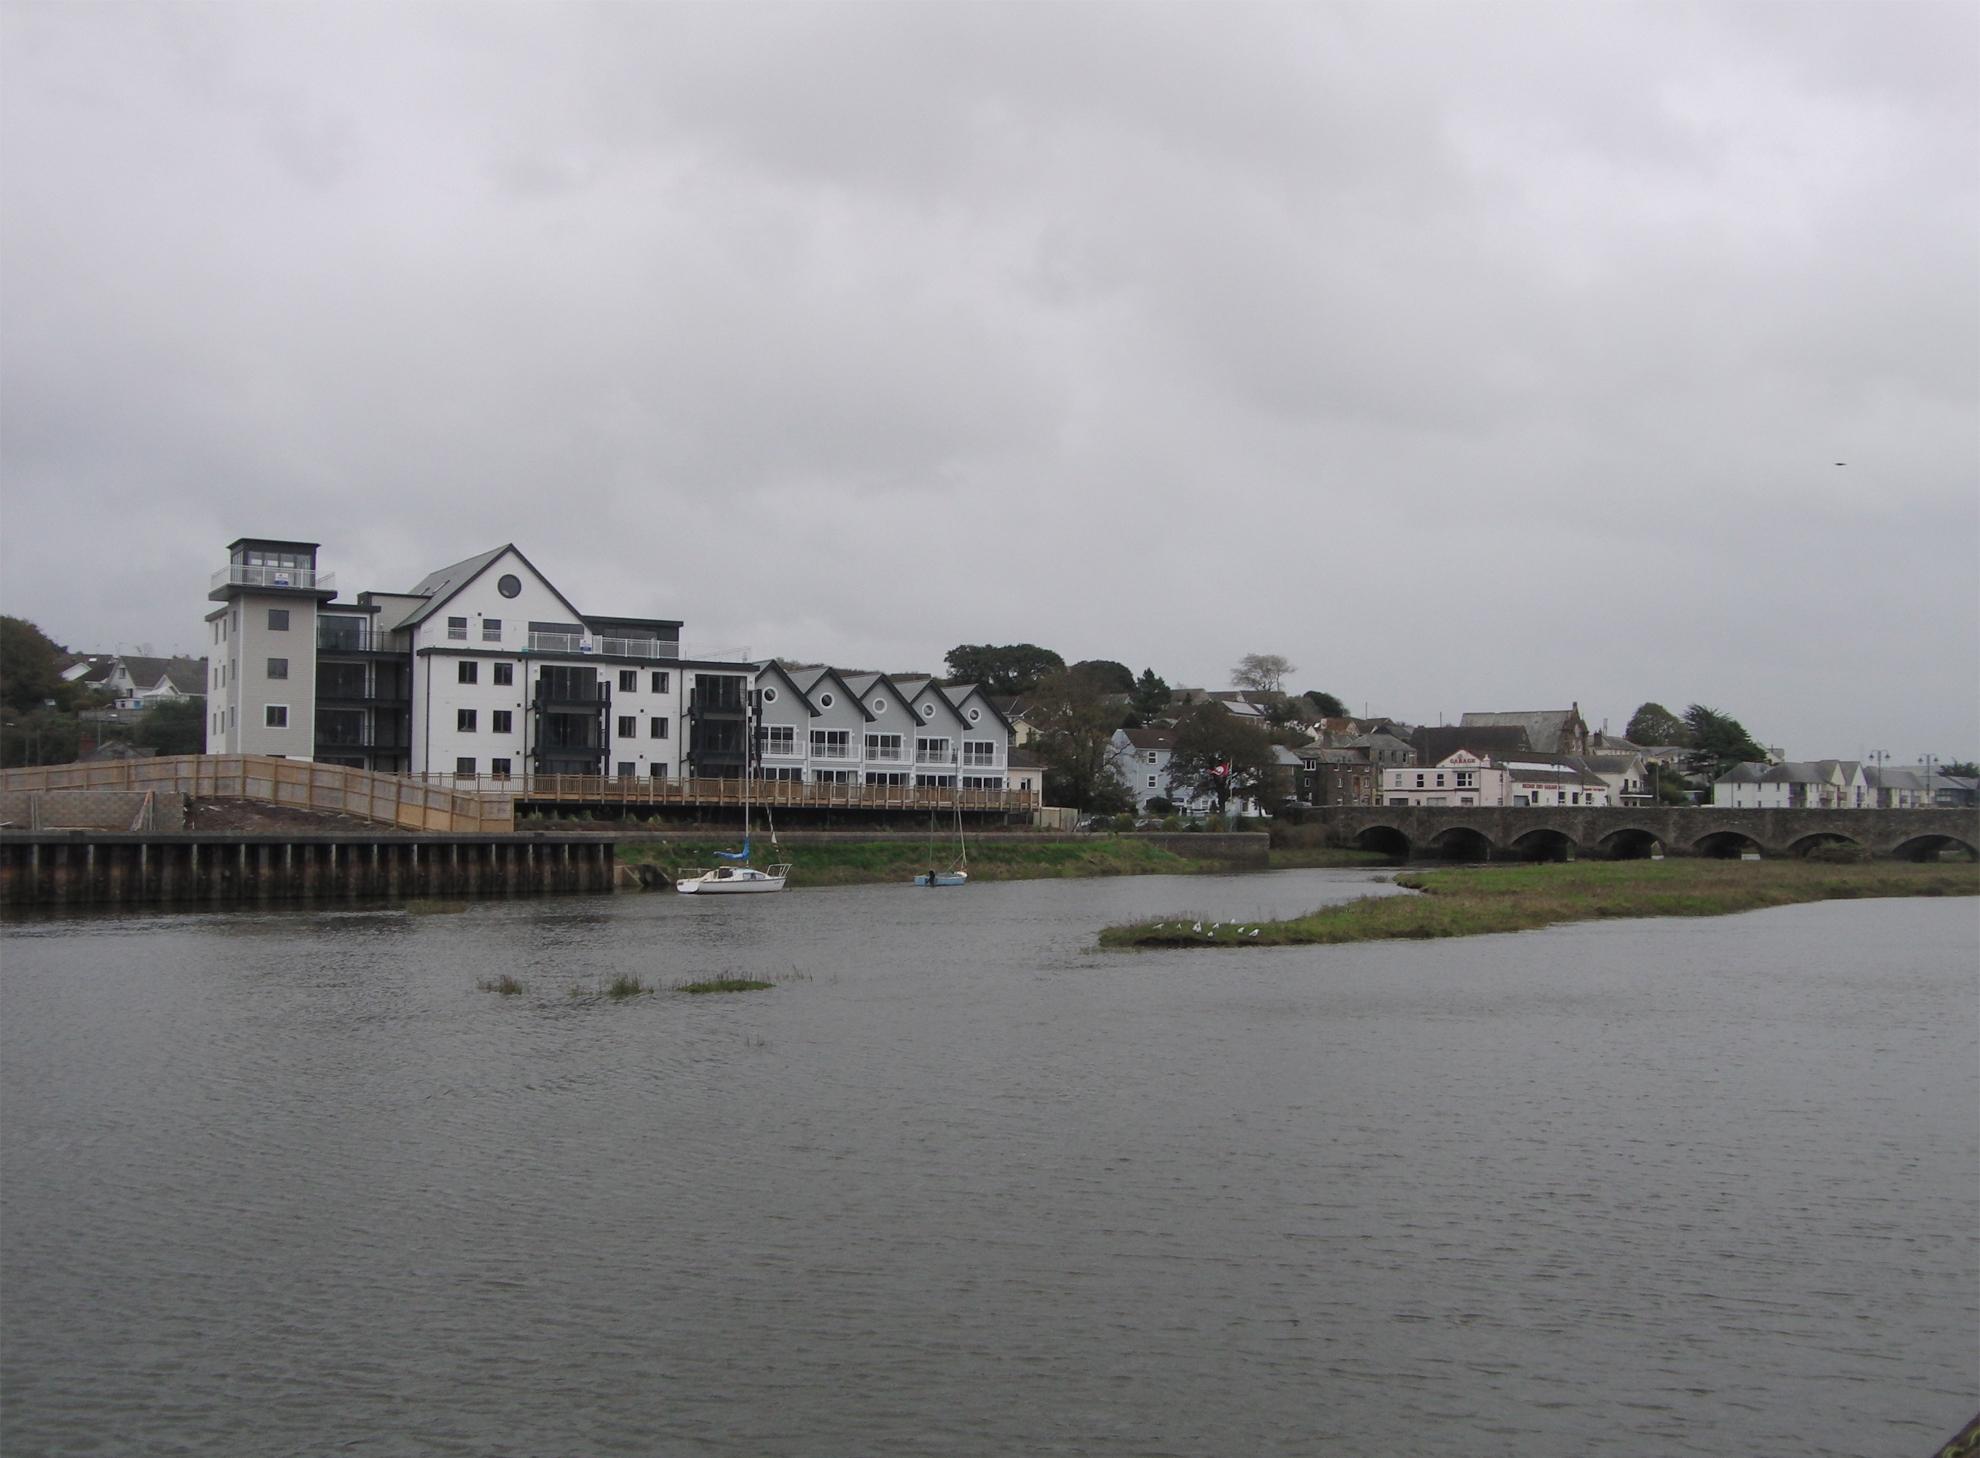 bradfords-quay-outside